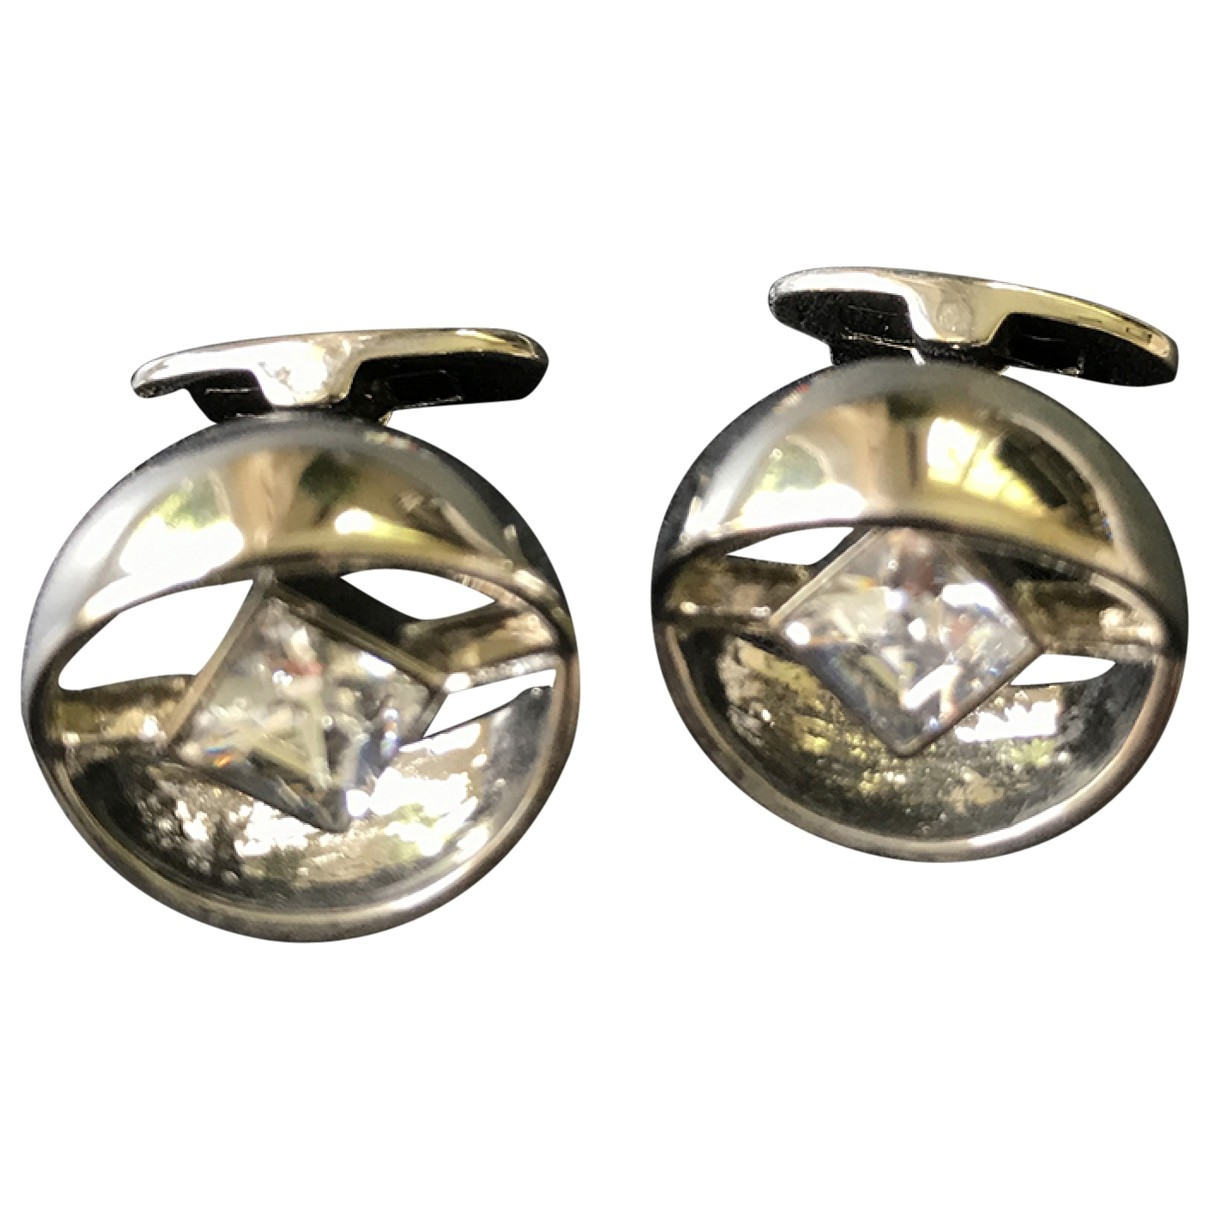 Paul Smith \N Manschettenknopfe in  Silber Metall